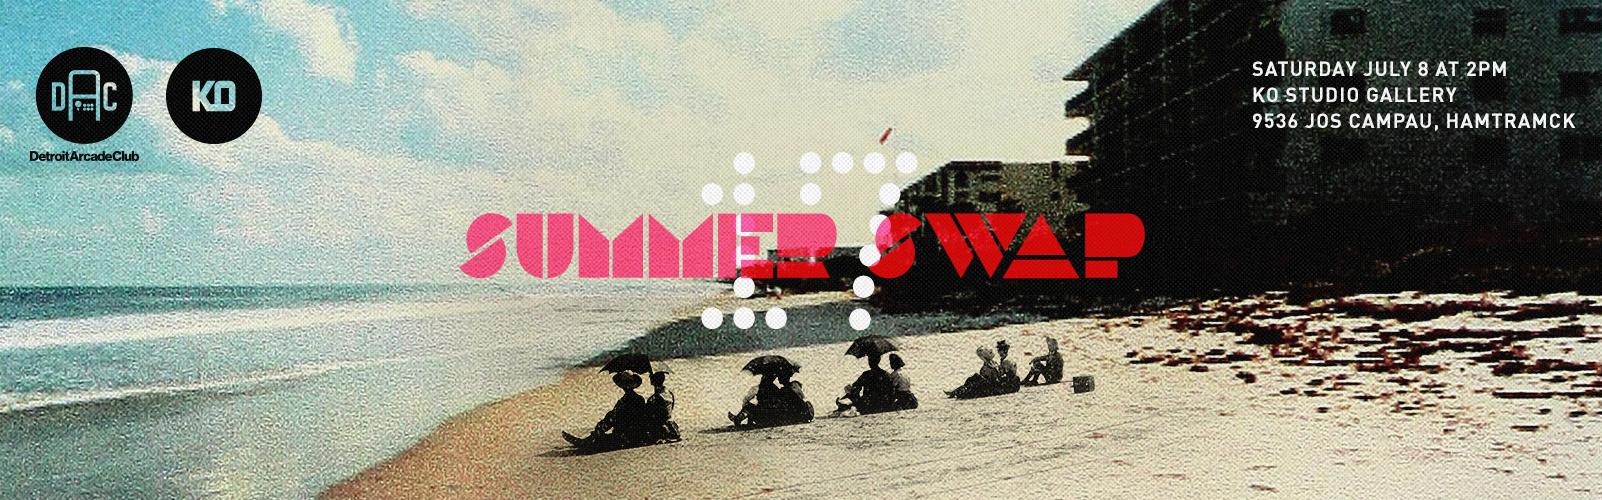 DAC-FB-SummerSwap17.png